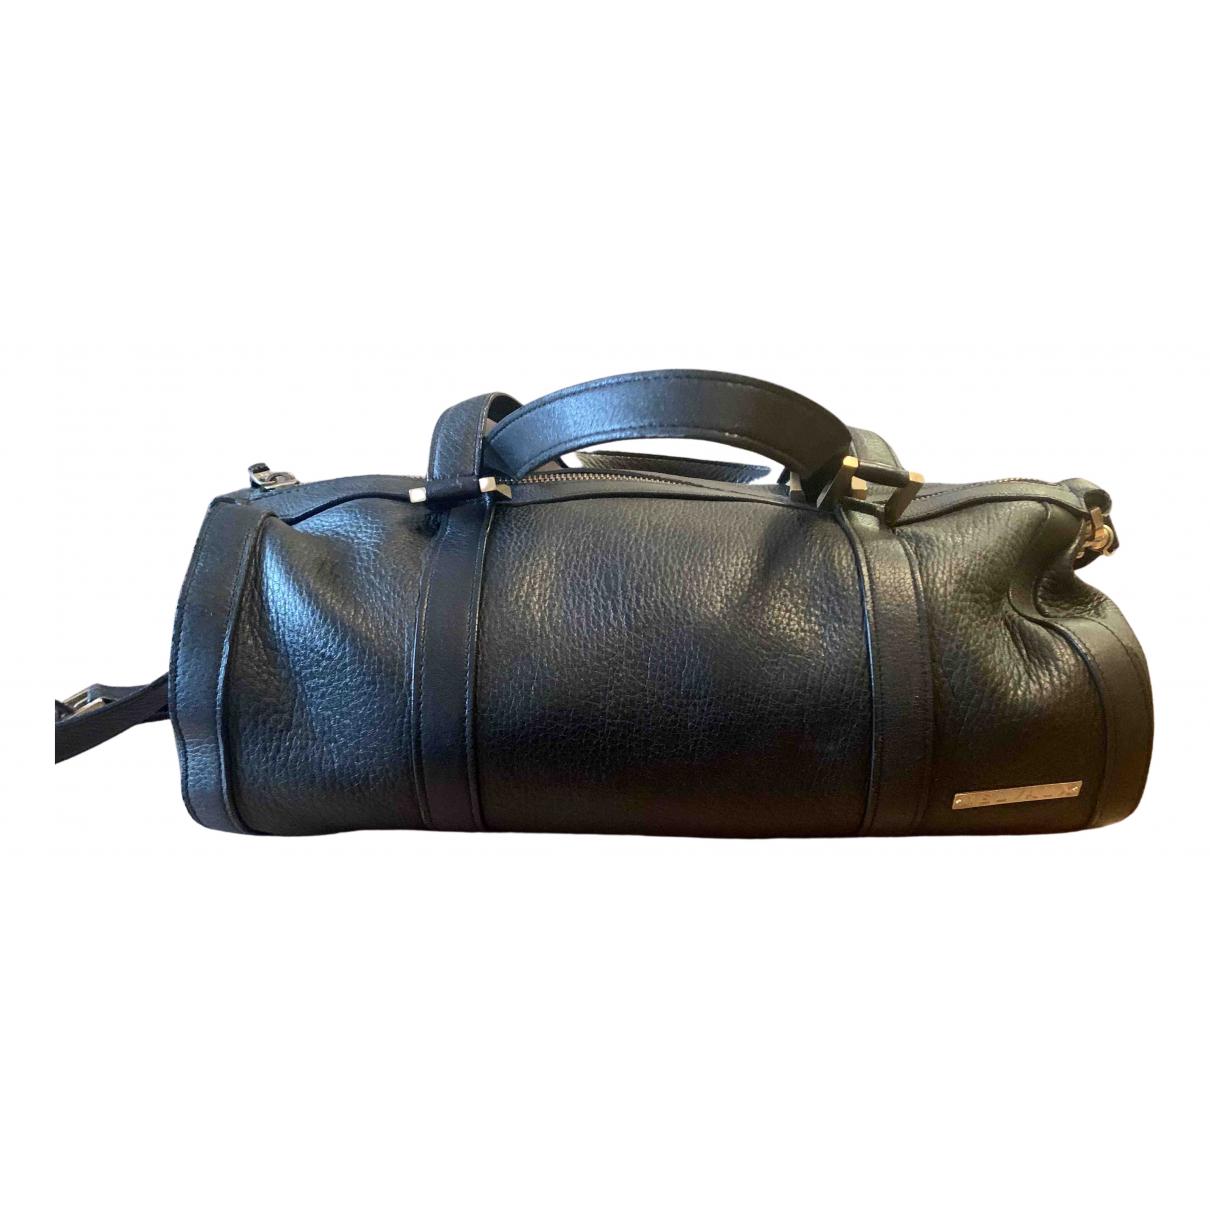 Delvaux N Black Leather handbag for Women N